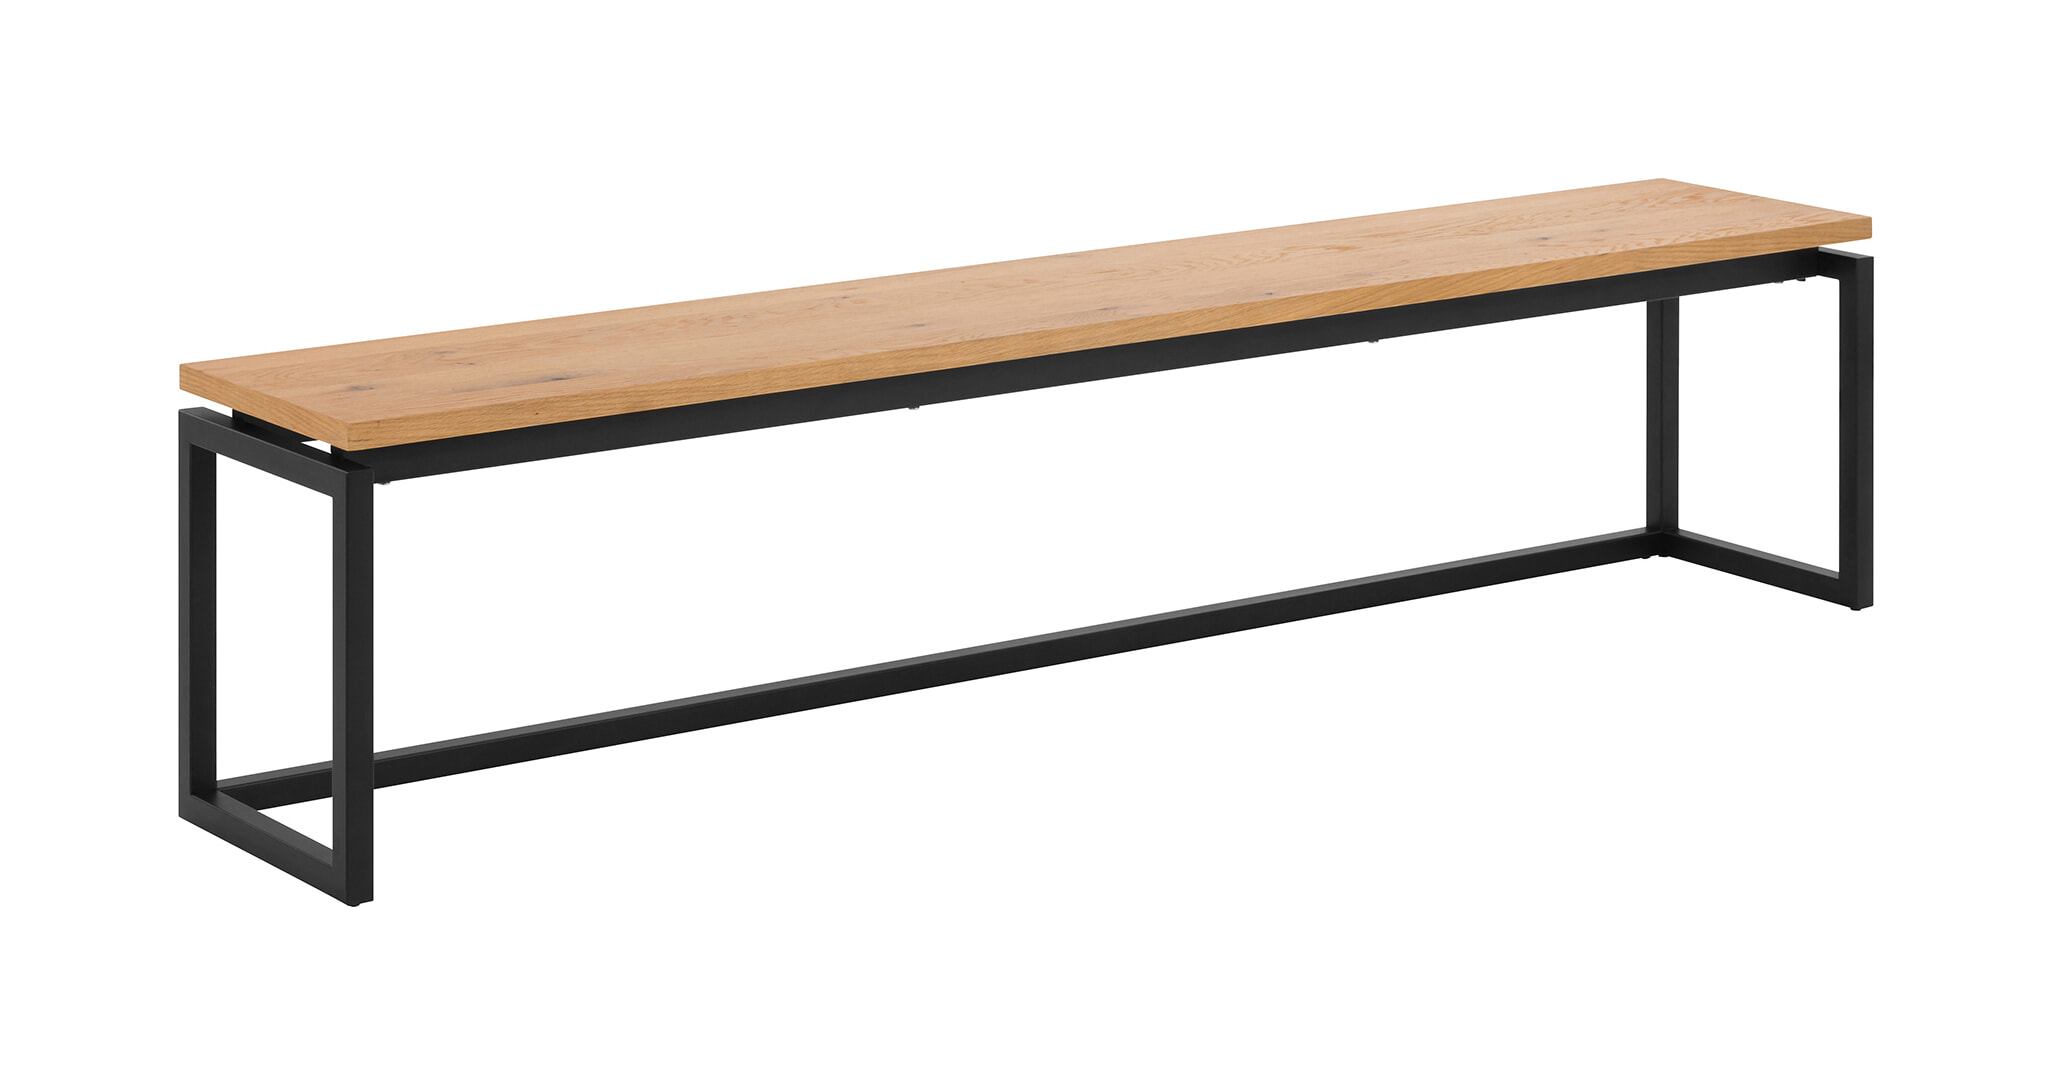 Interstil Eetkamerbank 'Dalarna' Eiken met zwart metaal, 160cm